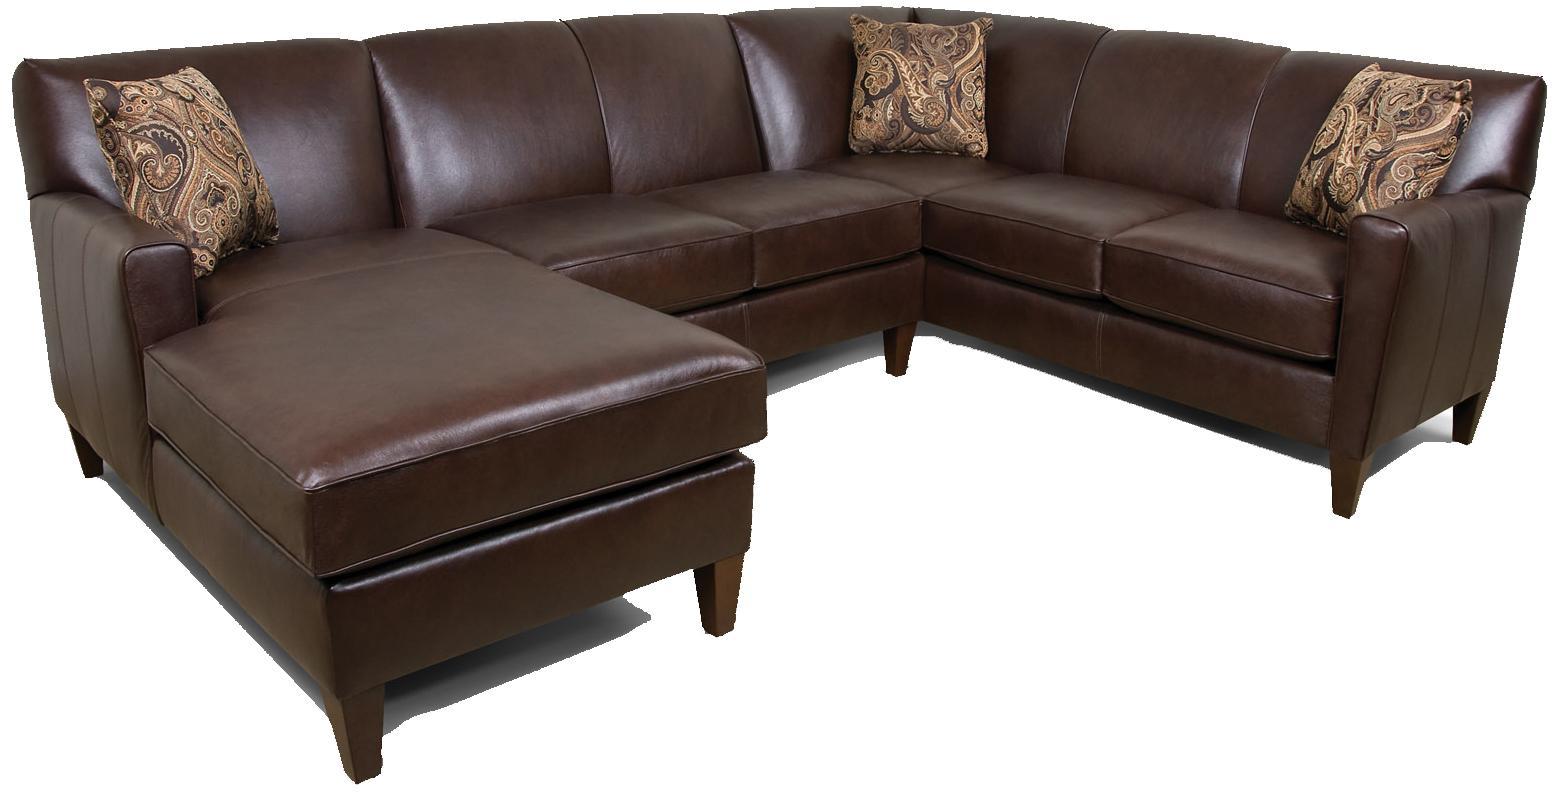 England Lynette 3-Piece Sectional Sofa - Item Number: 620006L+43L+63L